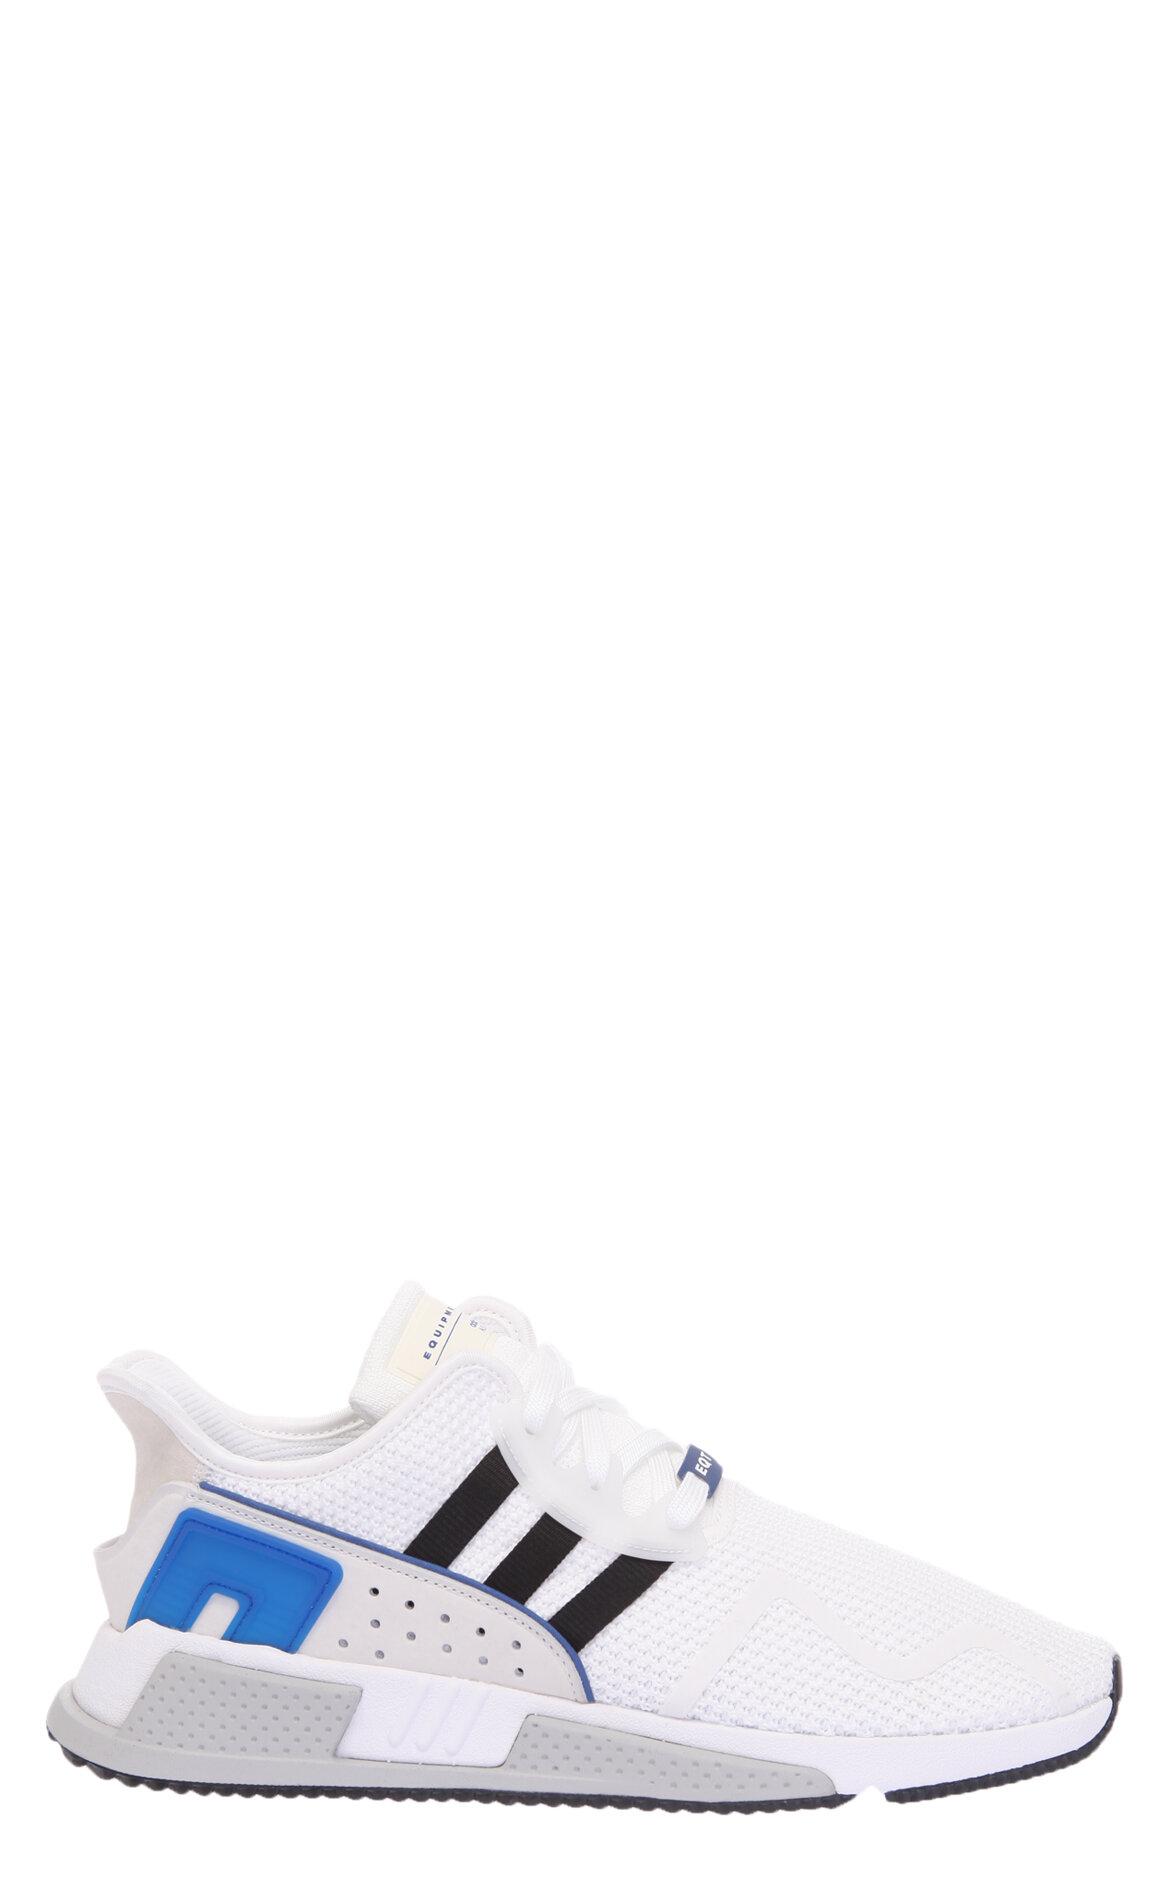 adidas originals EQT Cushion Spor Ayakkabı